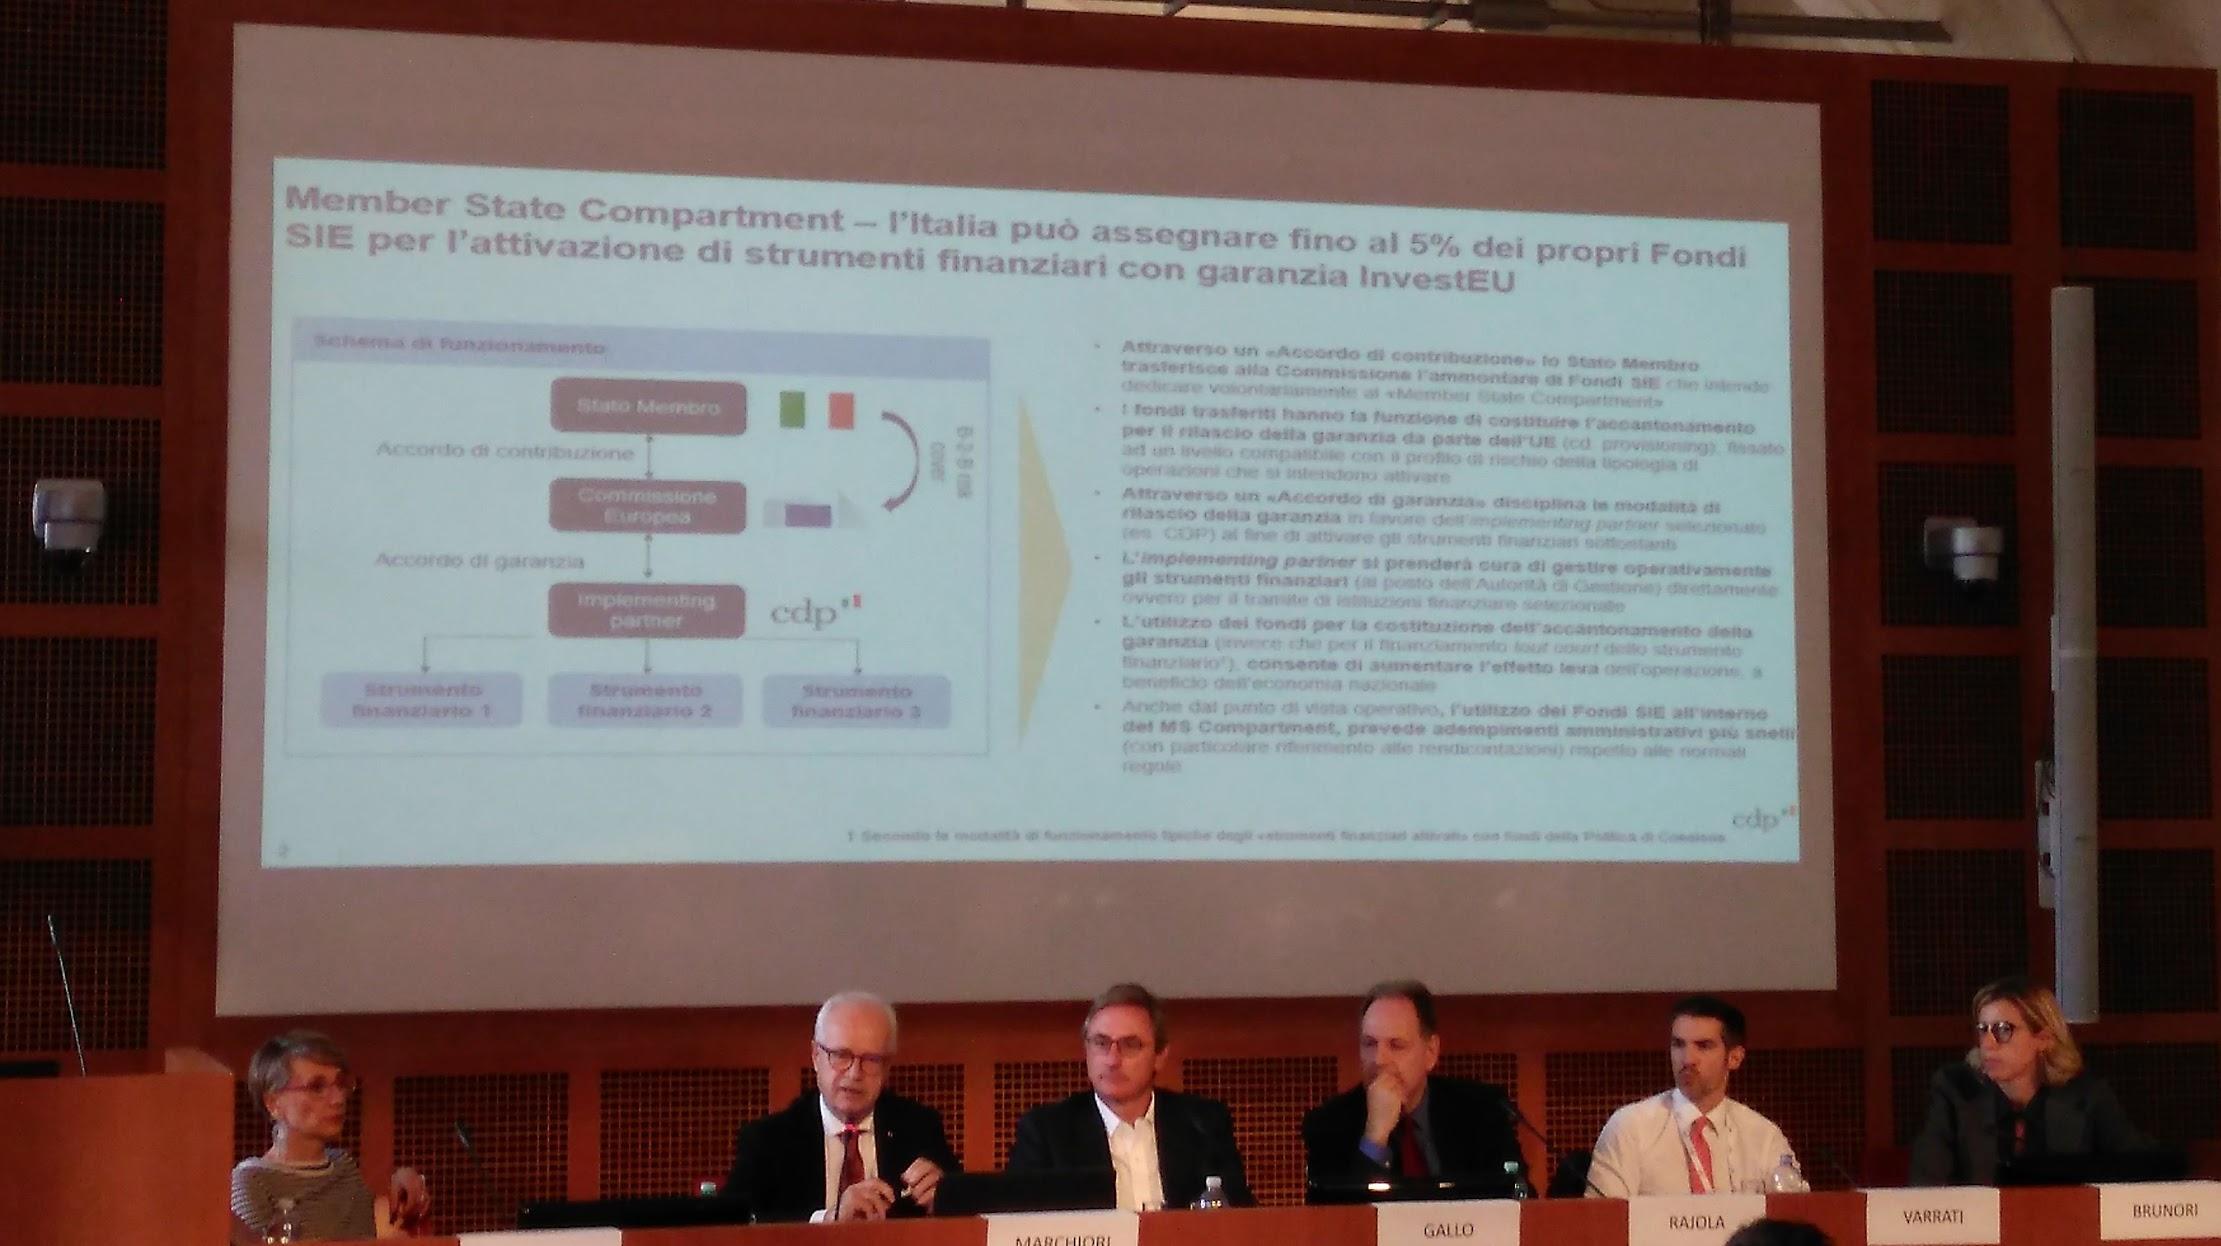 Convegno InvestEU ABI-Warrant HUB Roma 30.09.2019